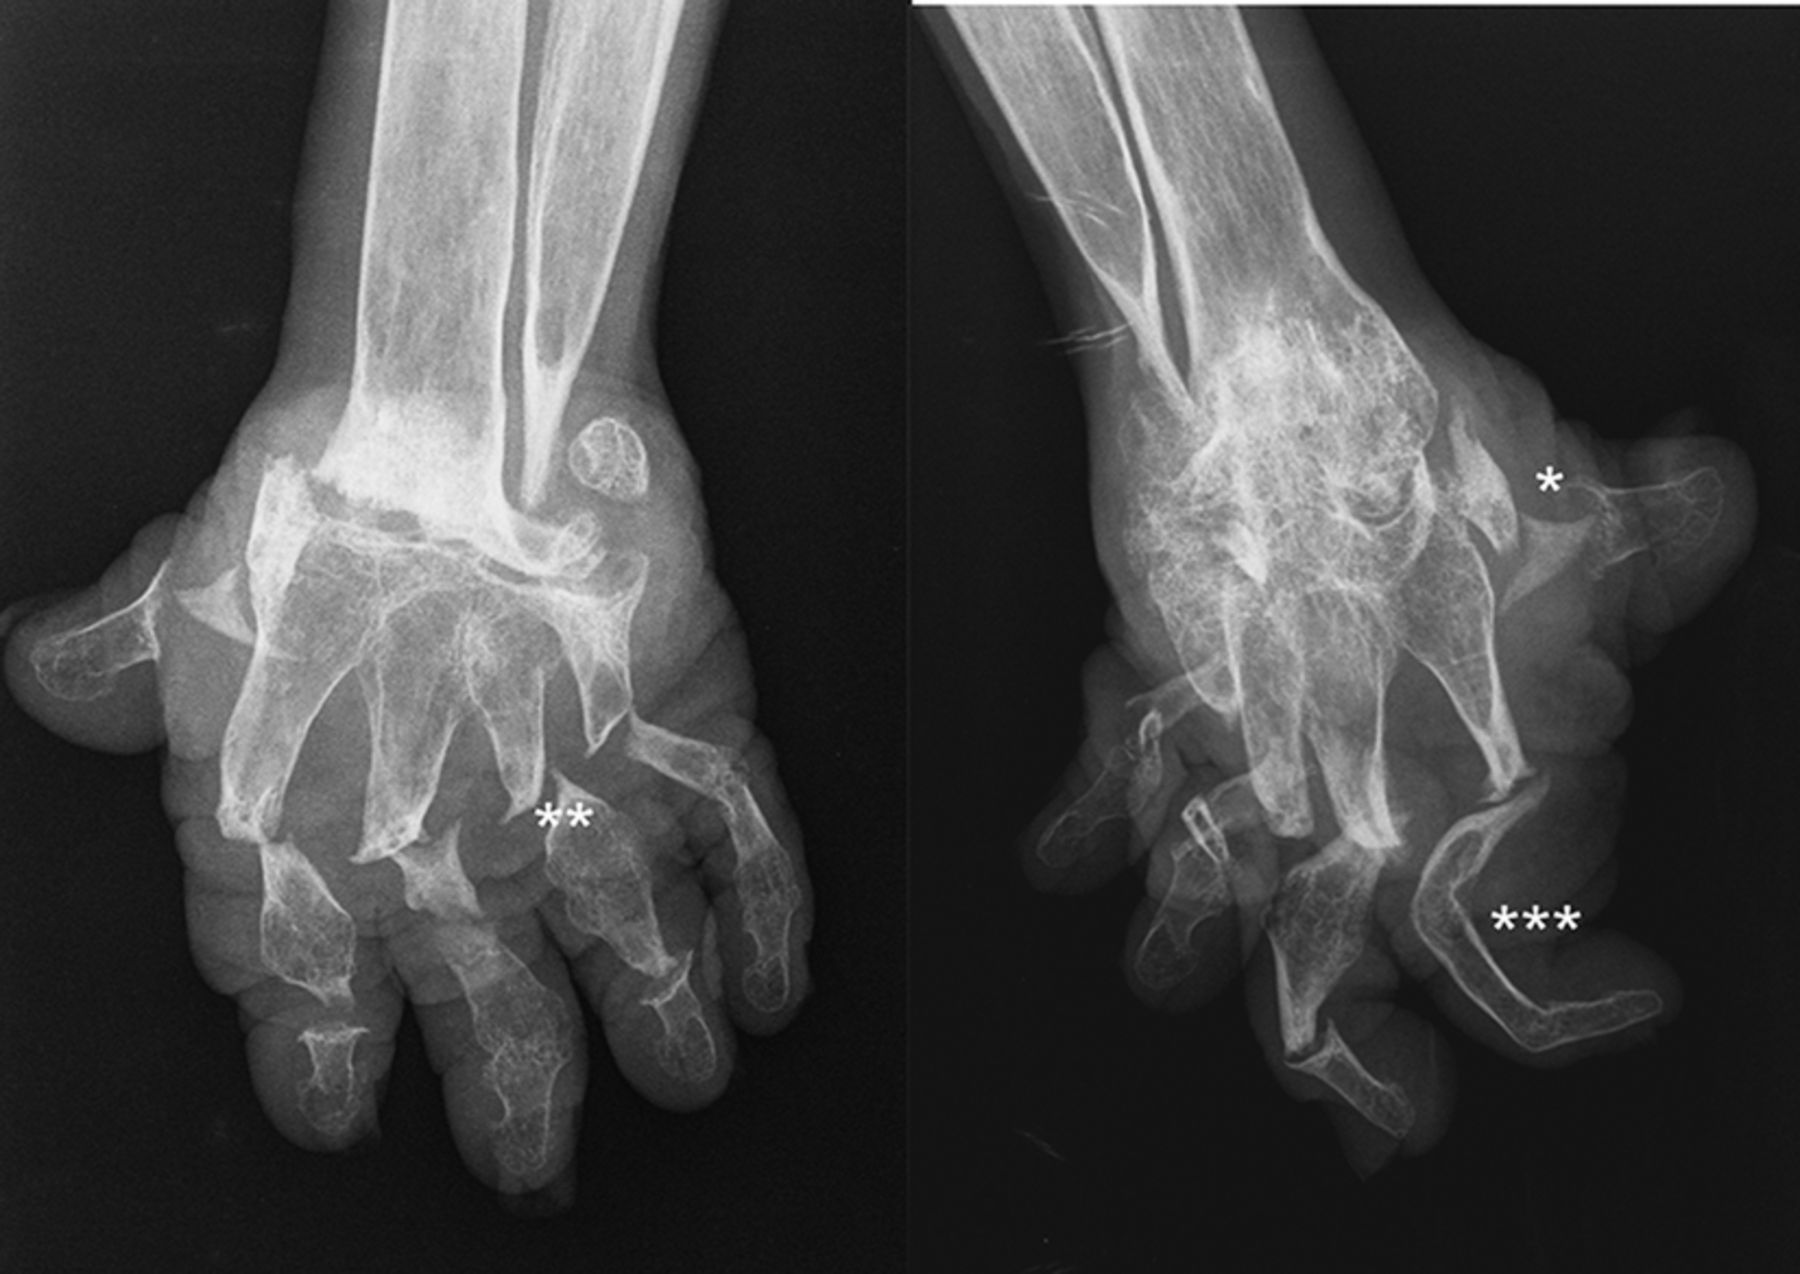 Opera glass hands the phenotype of arthritis mutilans